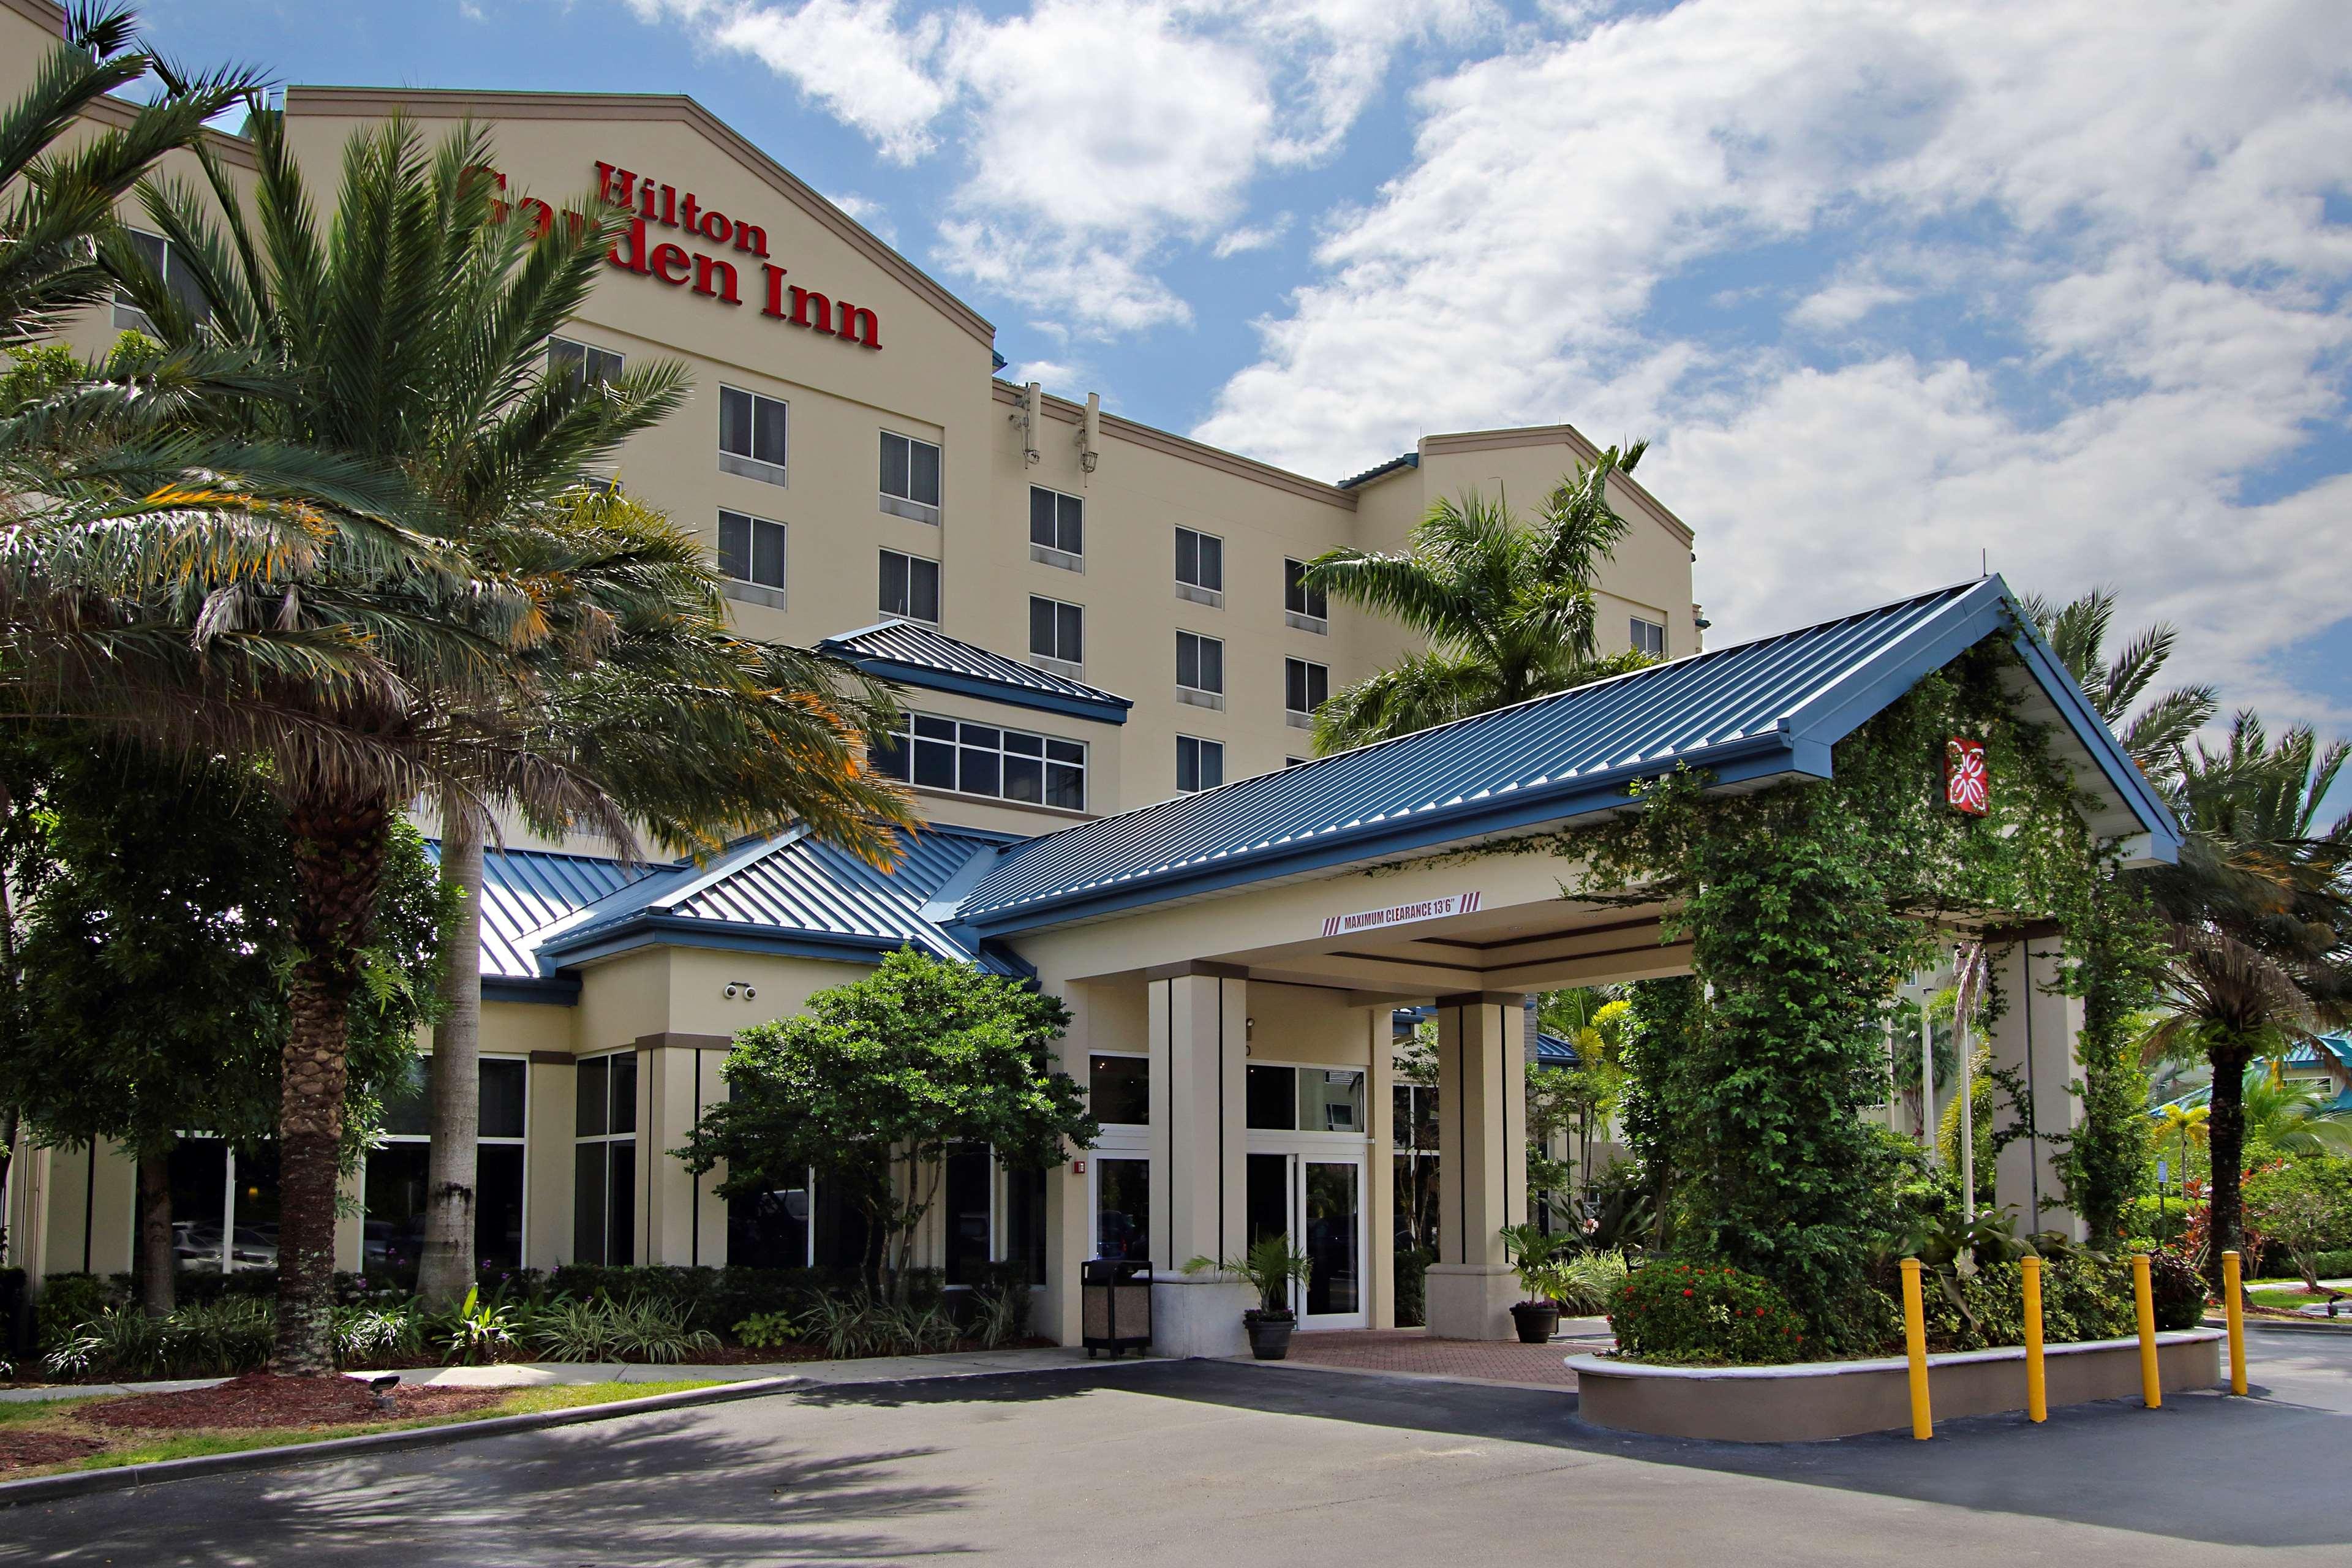 Hilton garden inn miami airport west 3550 nw 74th ave - Hilton garden inn miami airport west ...